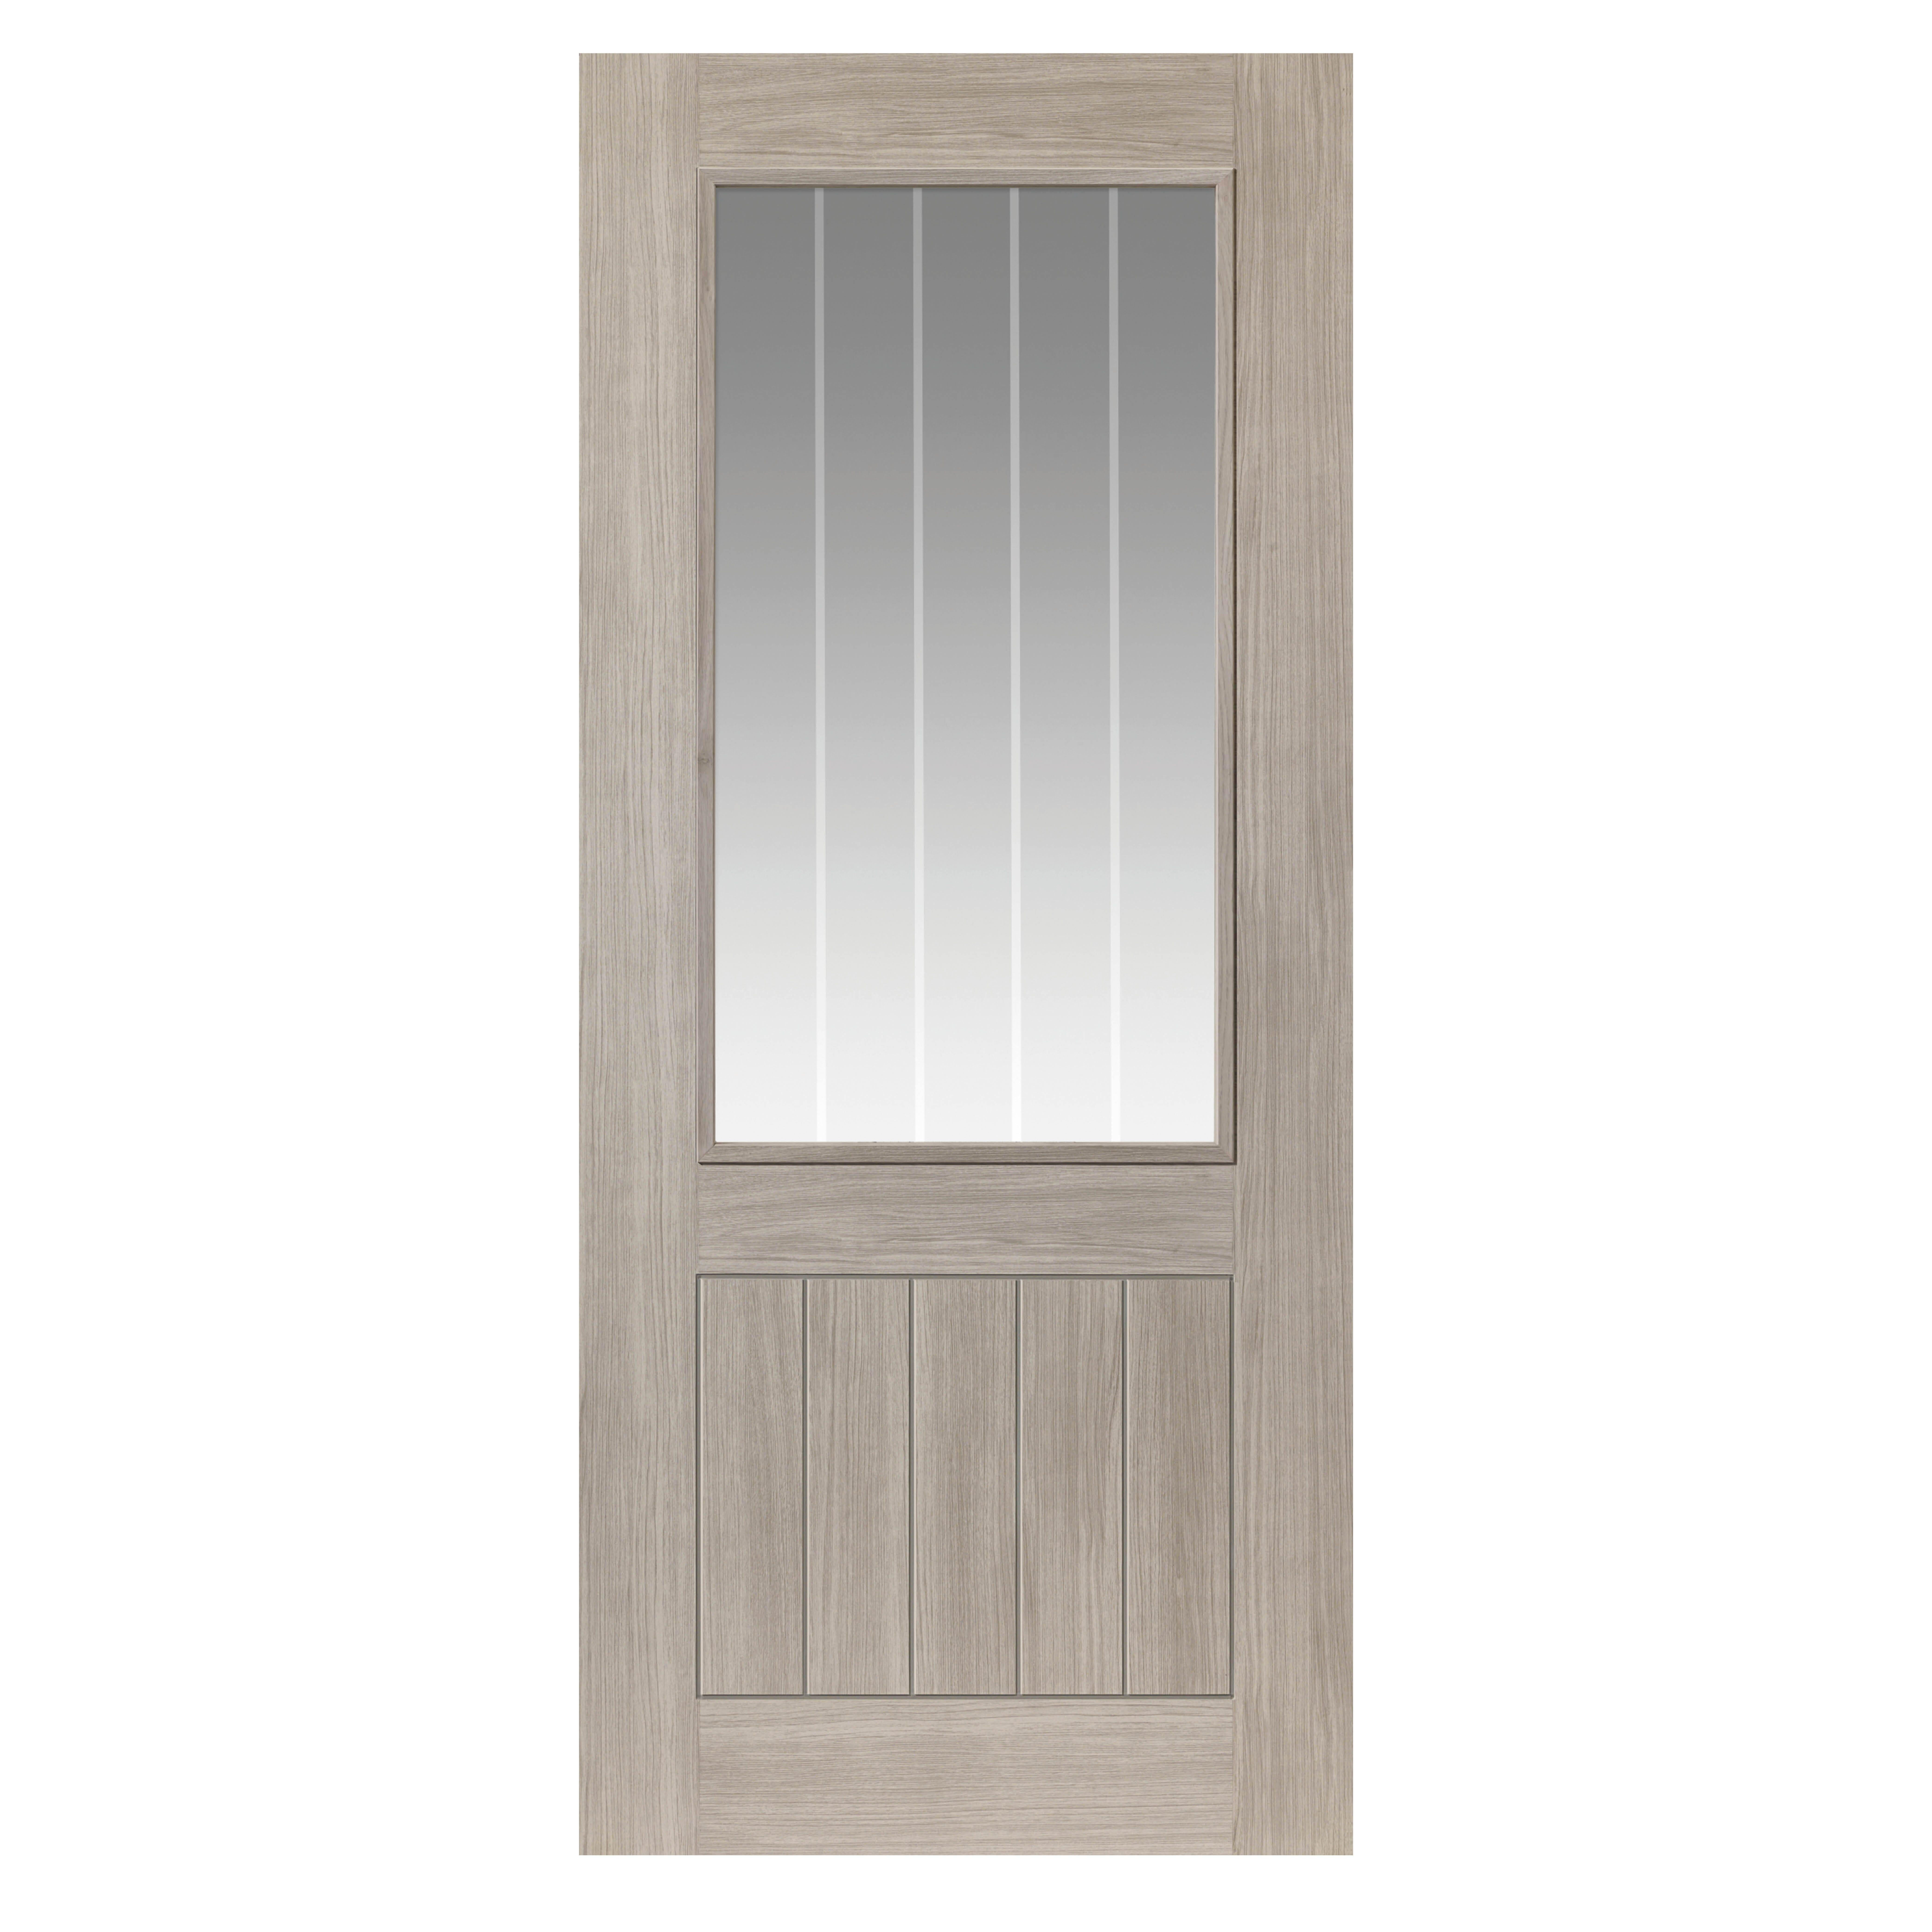 SHAKER CLEAR GLAZED OAK VENEER DOOR 1981mm X 838mm X 35mm